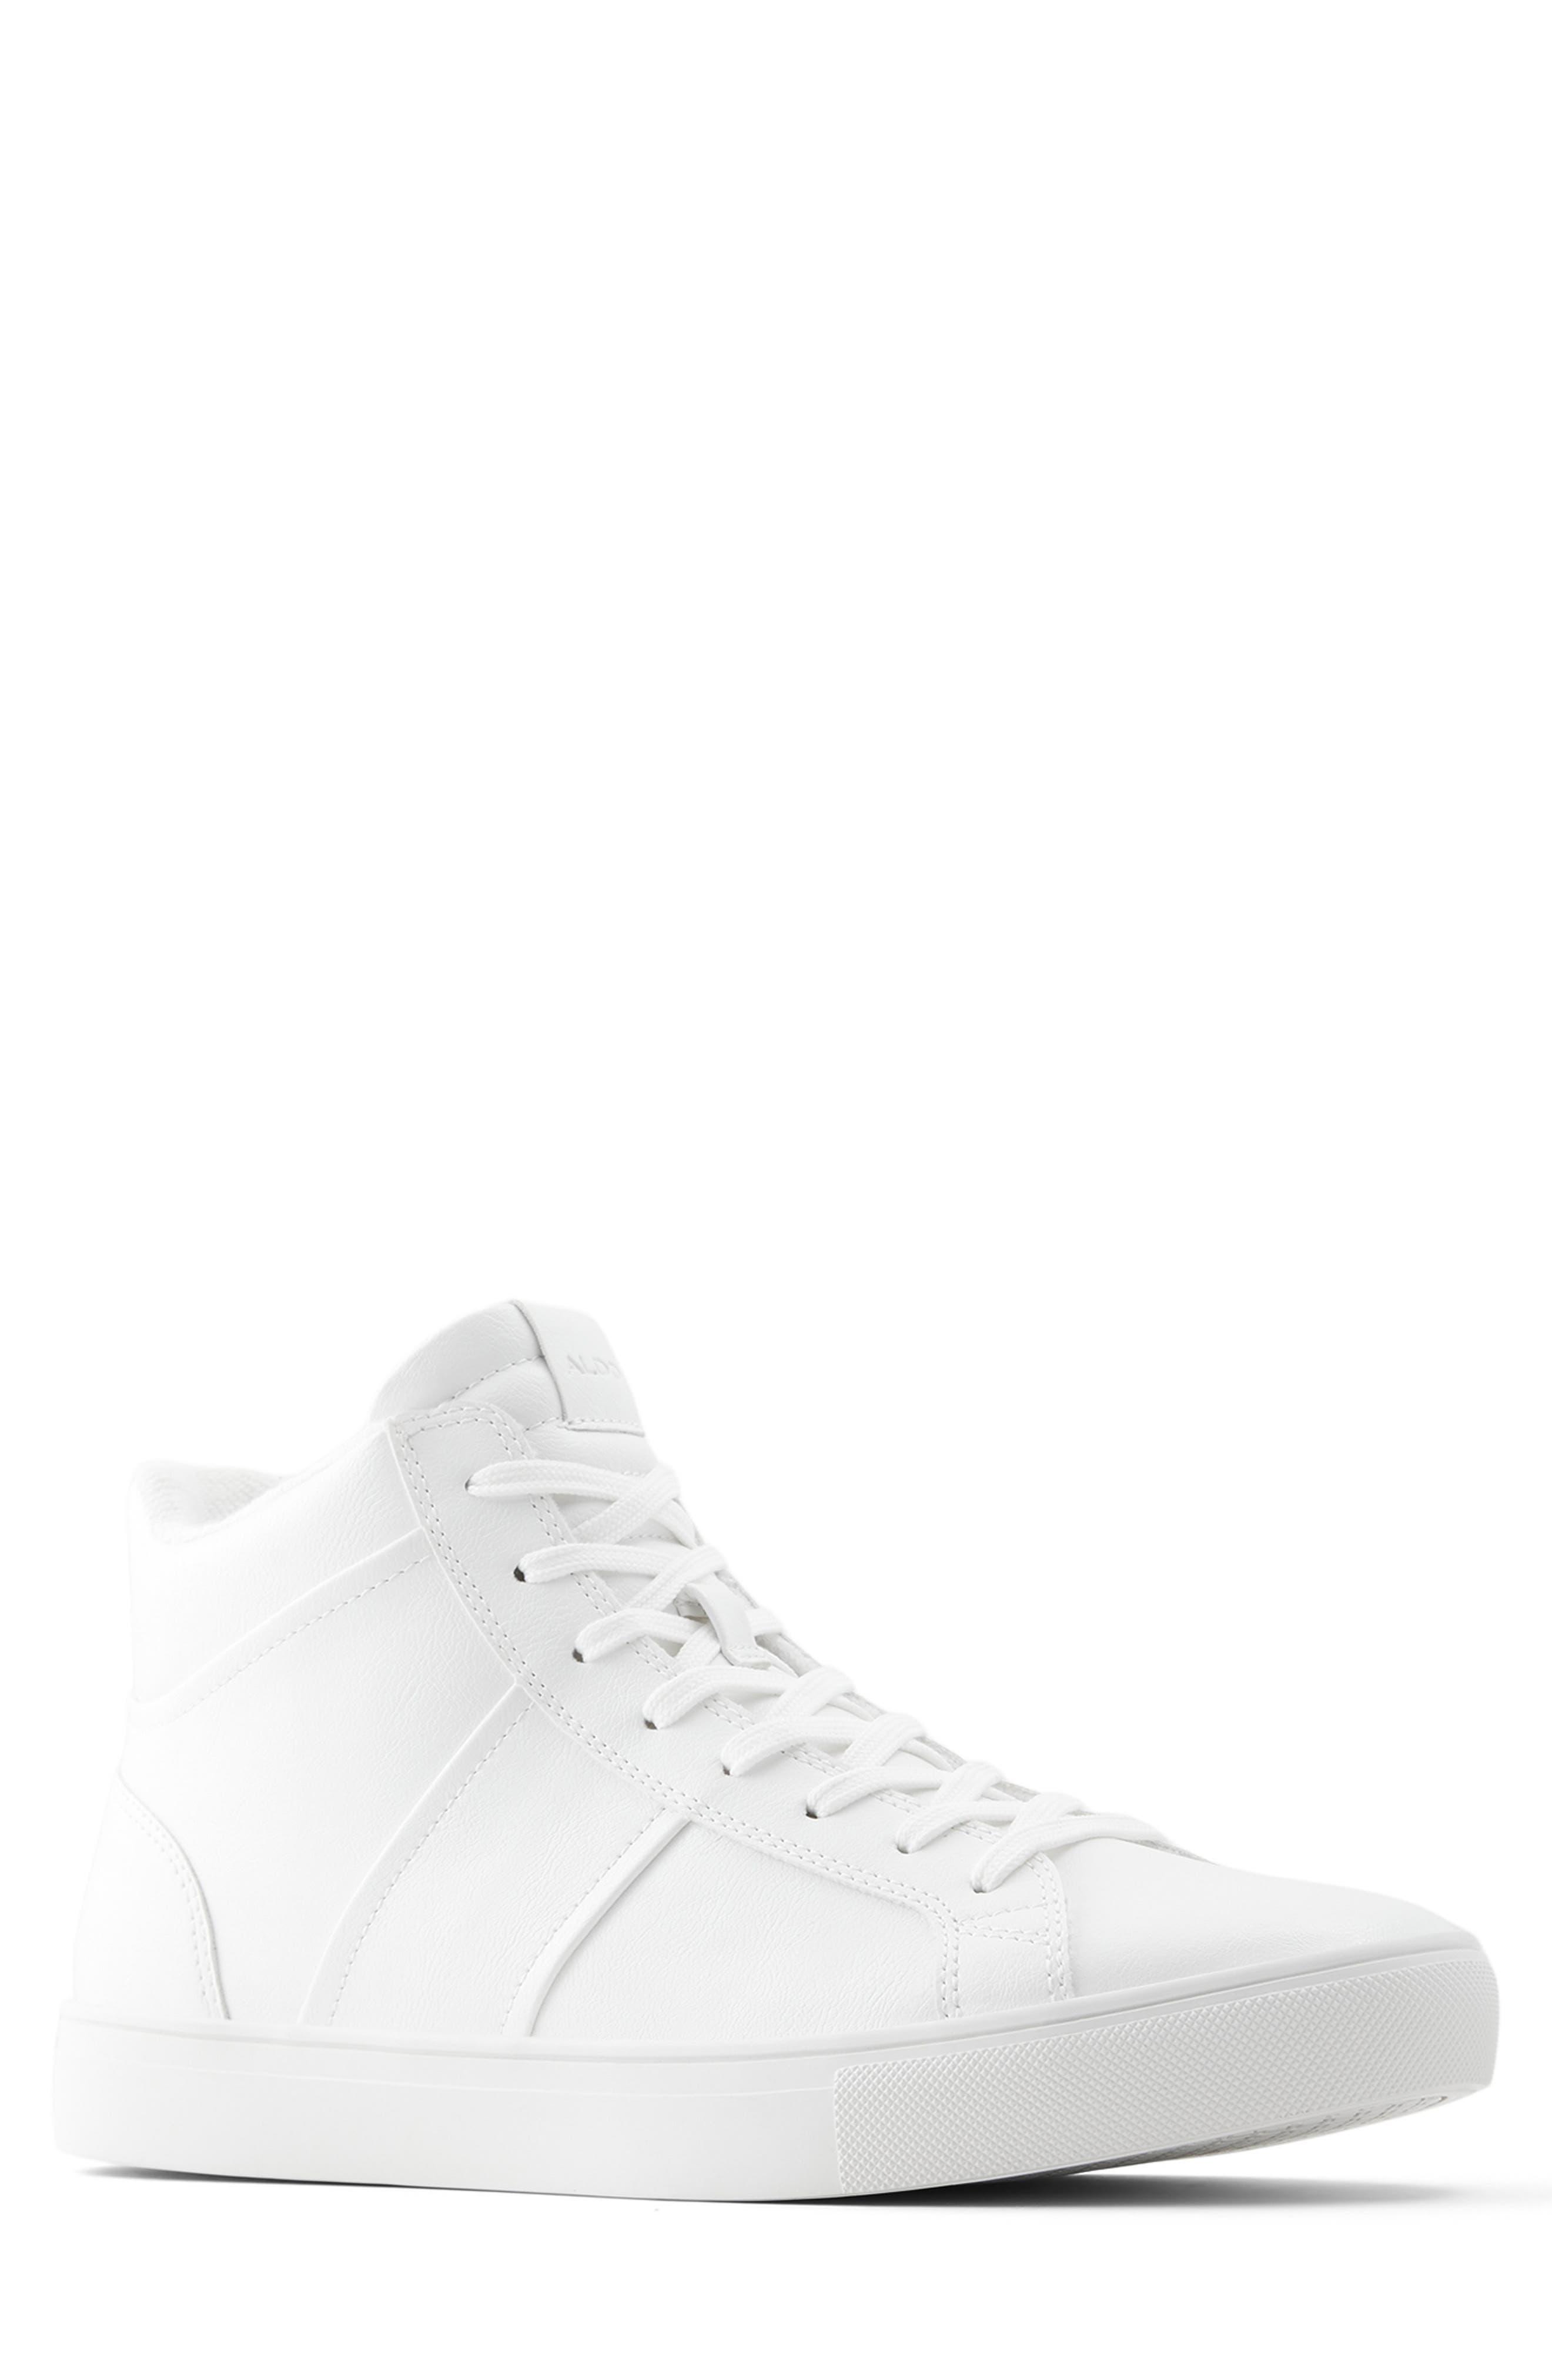 Balawen High Top Sneaker